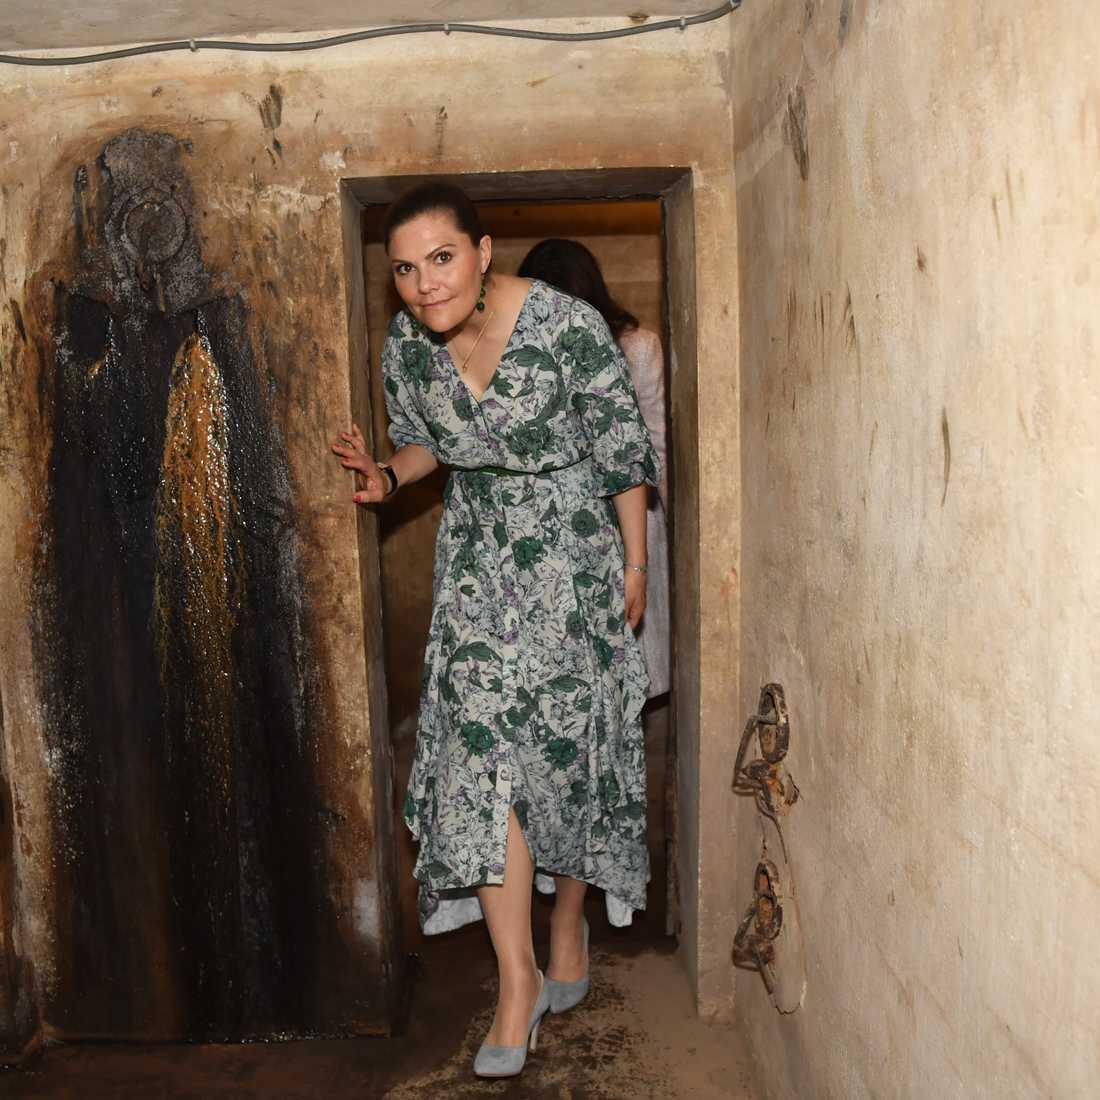 Kronprinsessan Victoria i ett skyddsrum på Hotel Metropole i Hanoi.